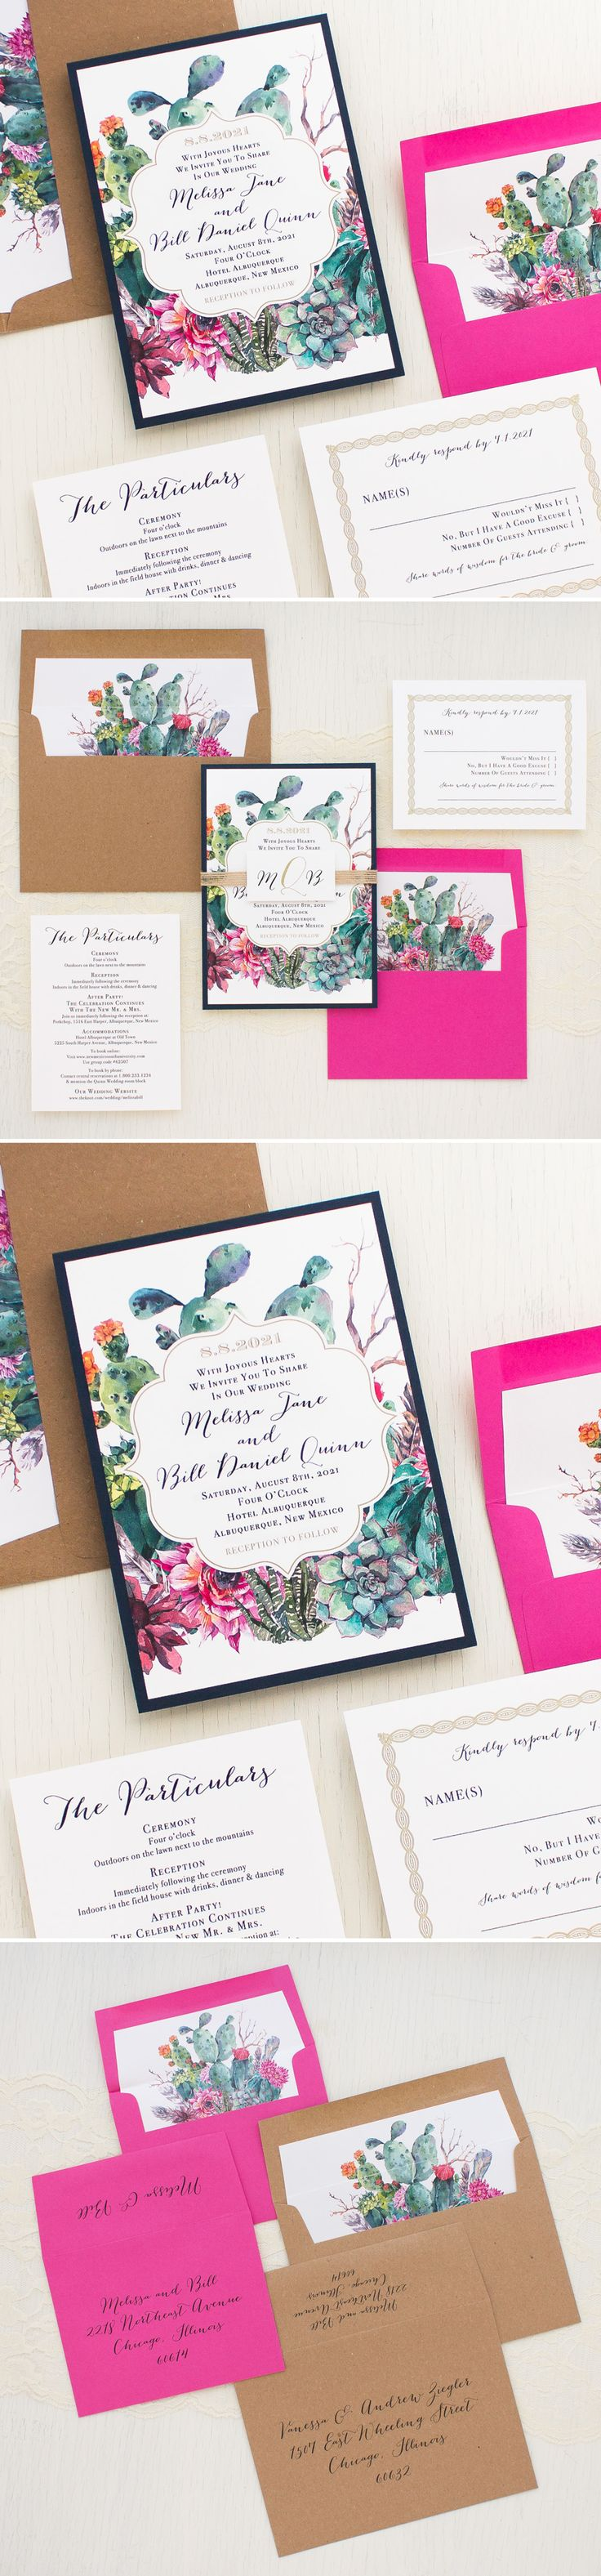 succulent wedding invitations succulent wedding invitations Cactus Inspired Wedding Invites With Bold Blooms Watercolor Succulents Navy Blue Burlap and